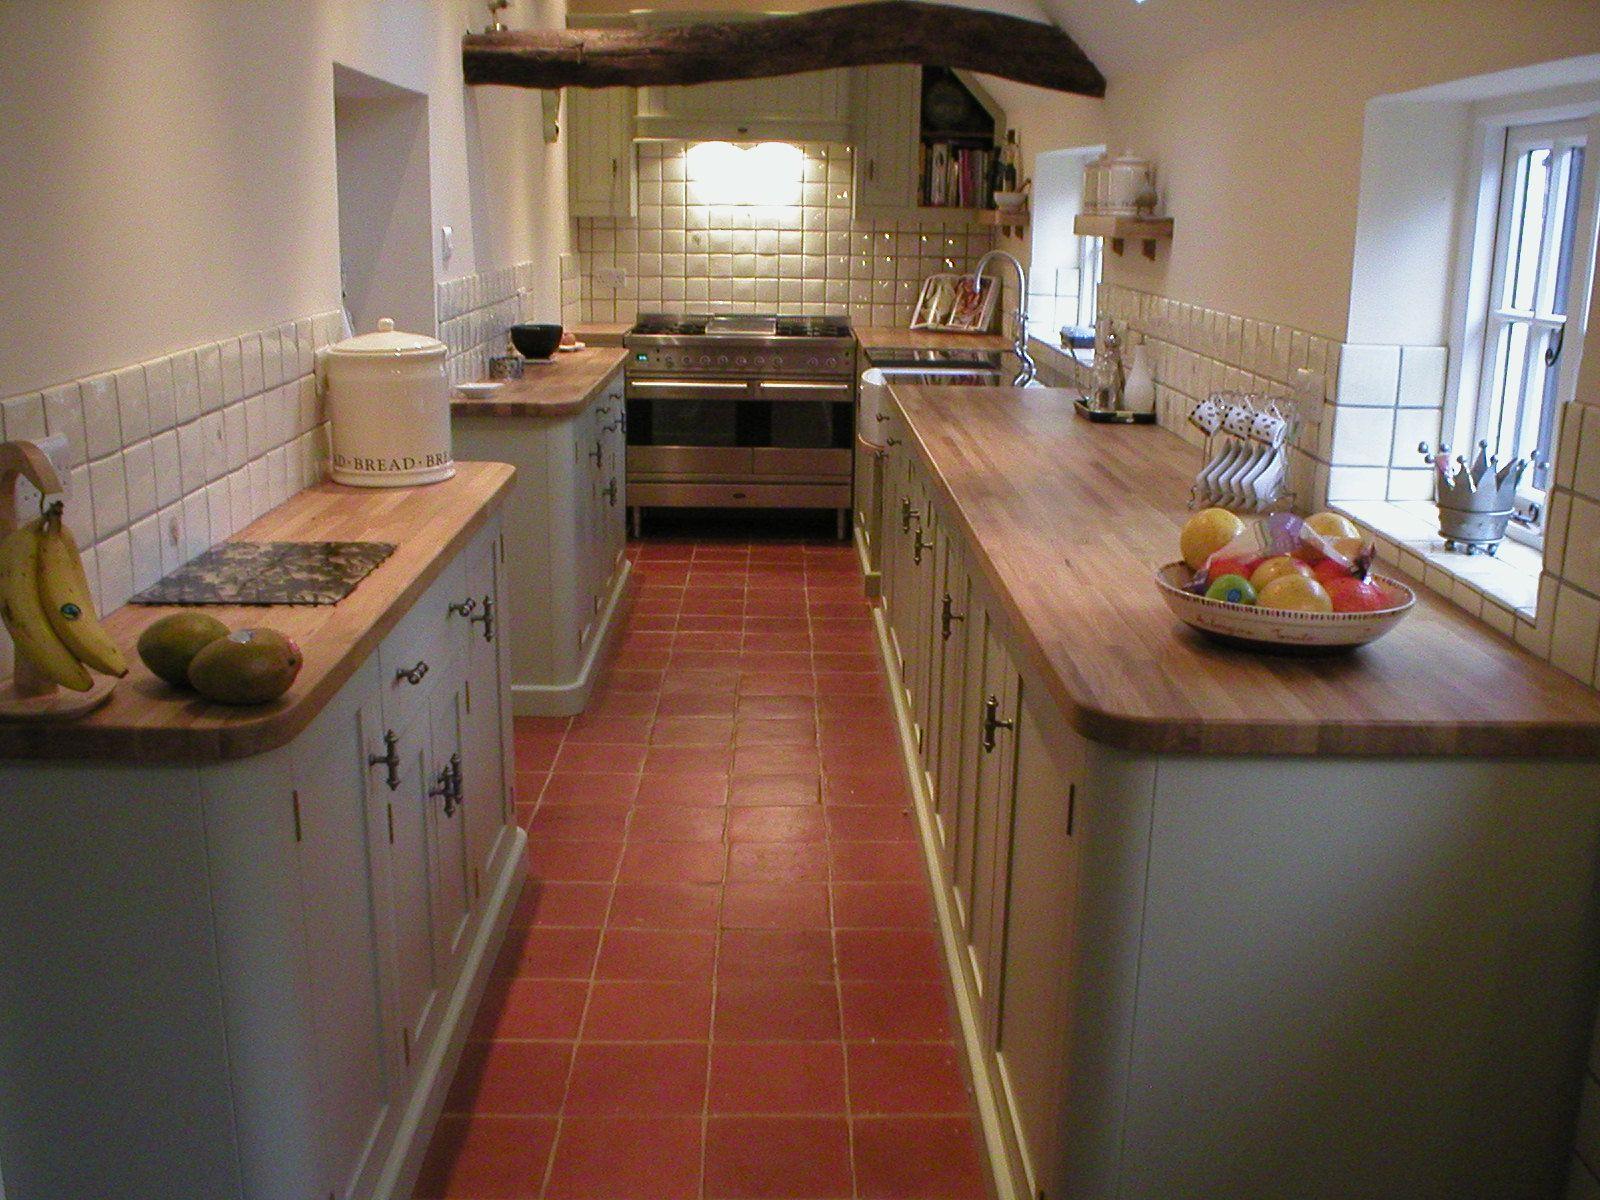 Bespoke Kitchen Units Cabinets Furniture Handmade In Kent Gallery 1